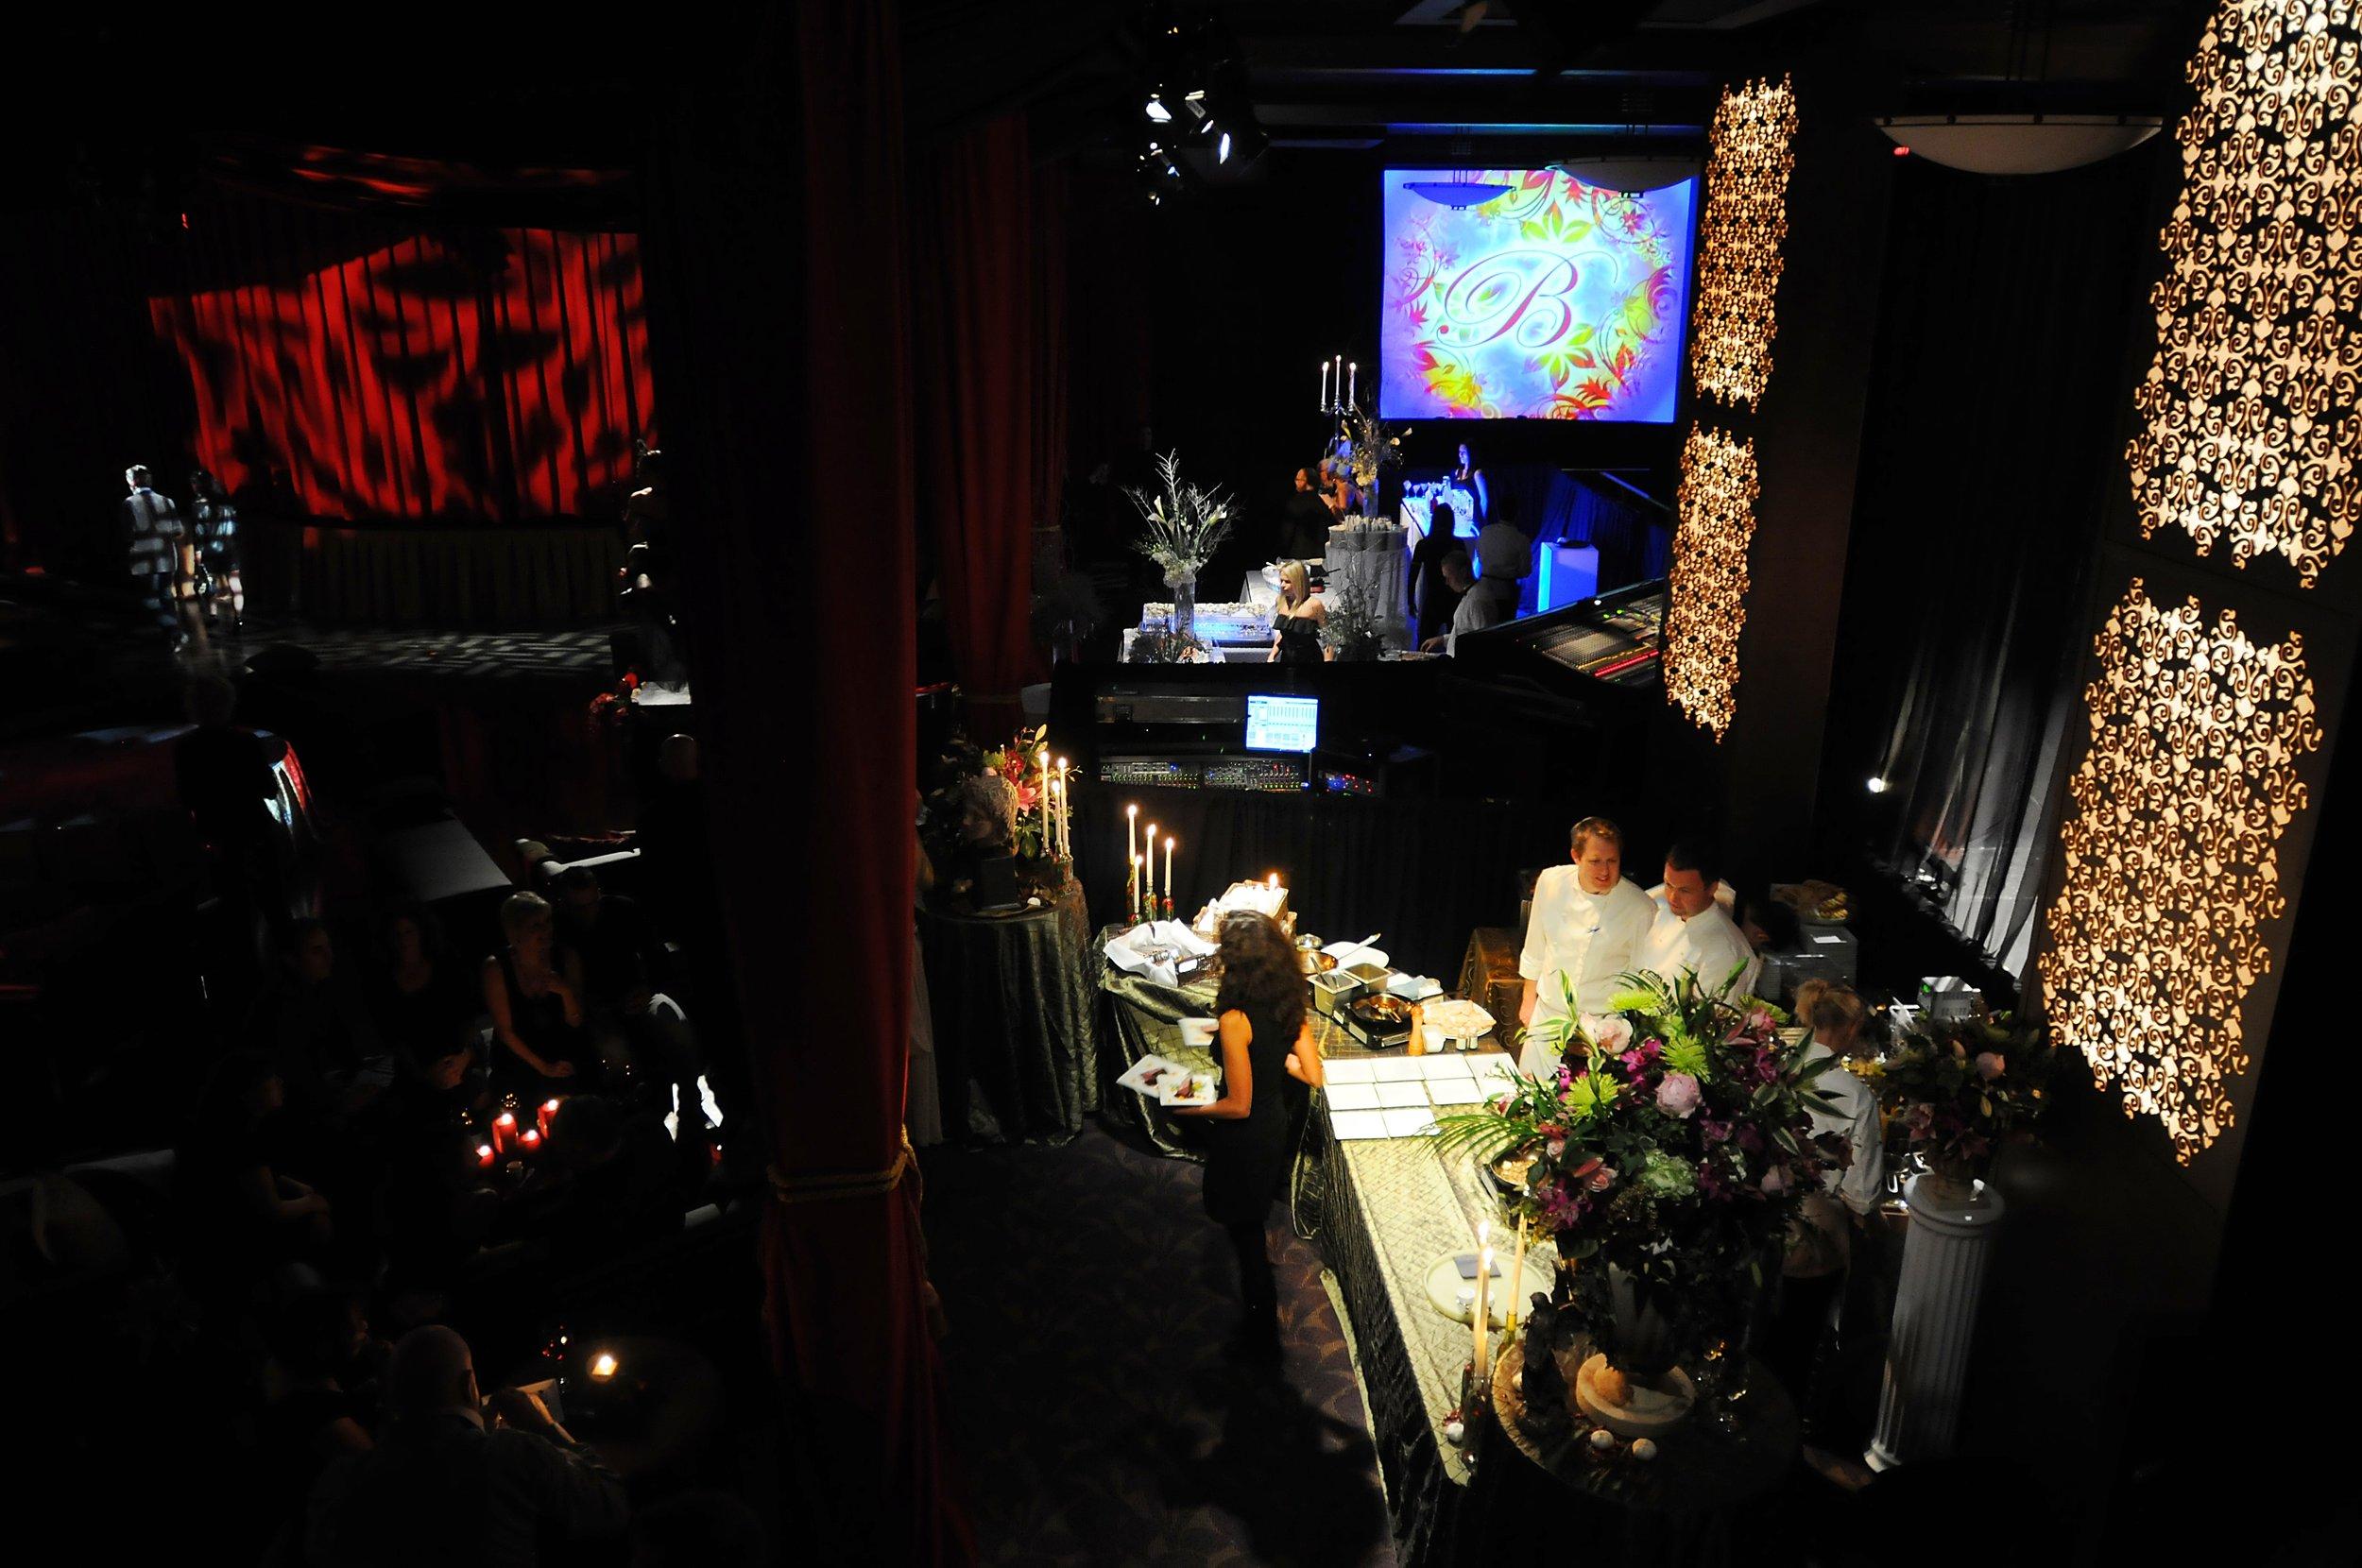 chef-station-from-mezzanine.jpg